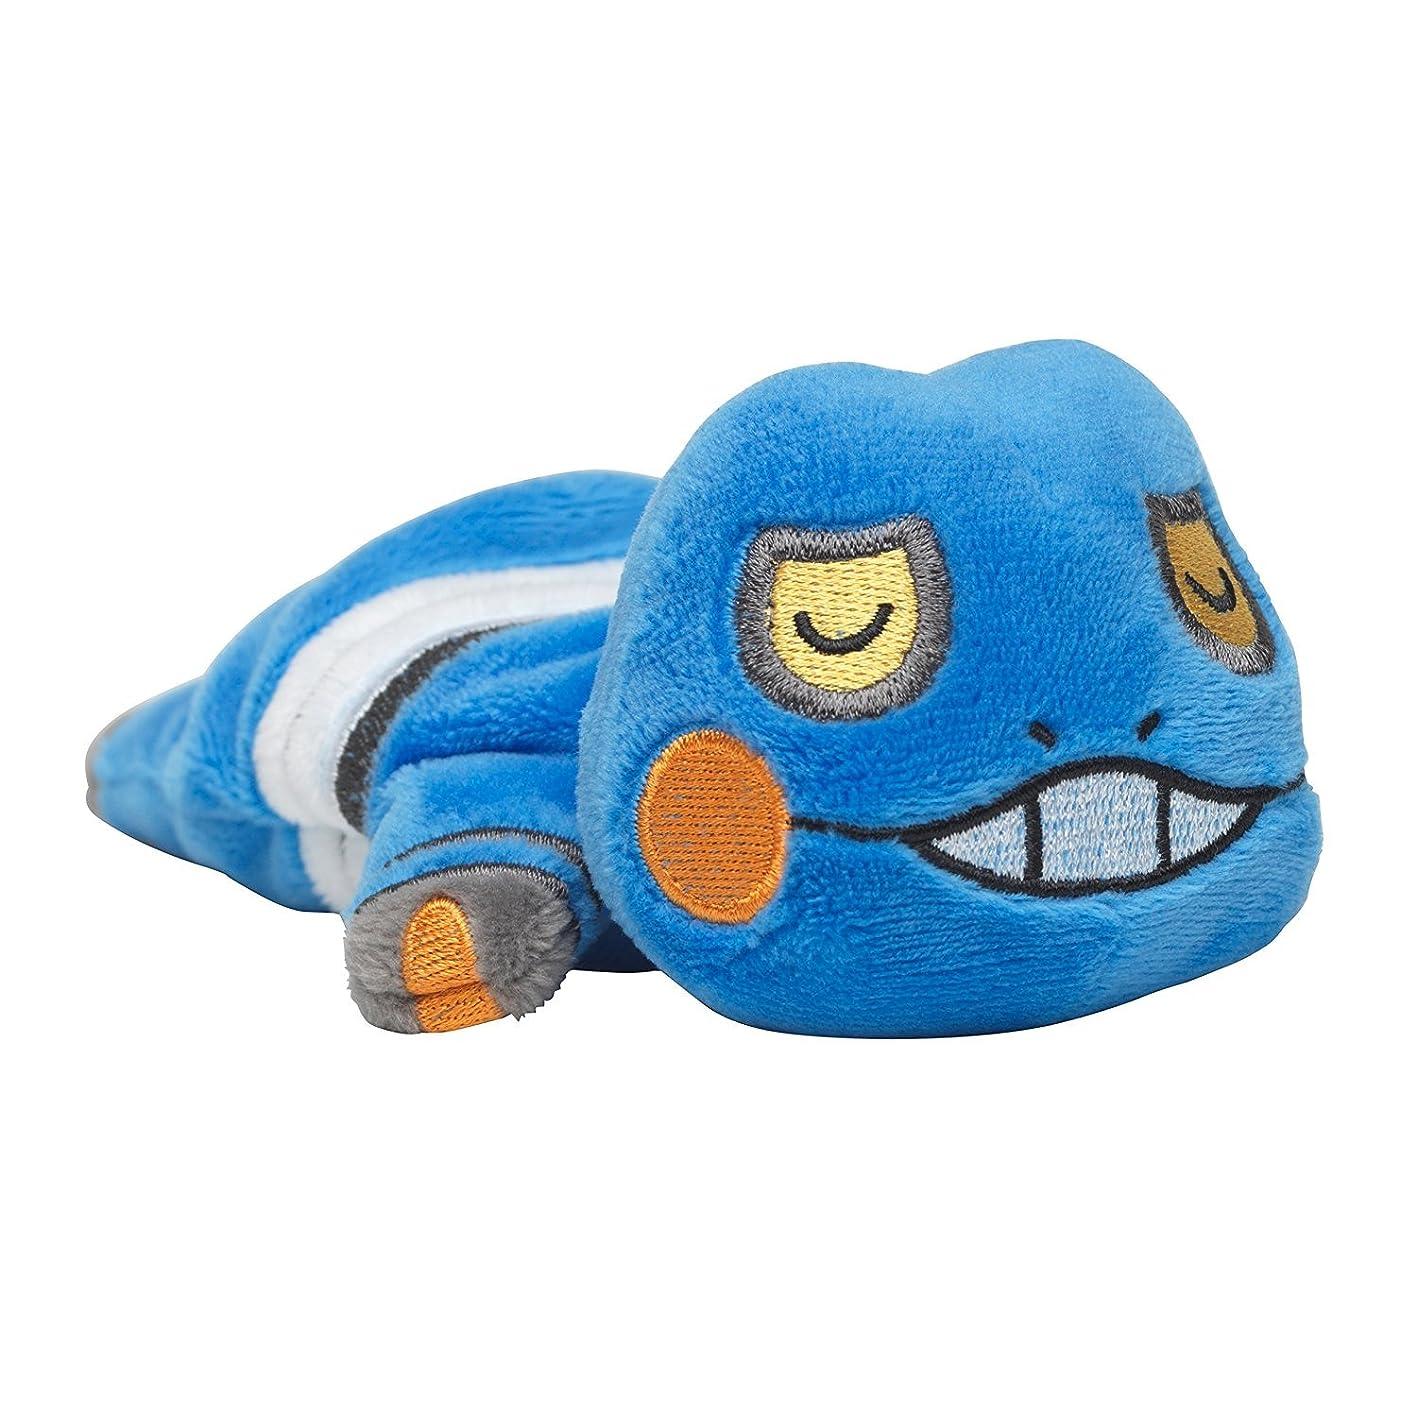 Pokemon Sleeping Croagunk Plush Good Night Ver. from Japan ltlxknadppe668